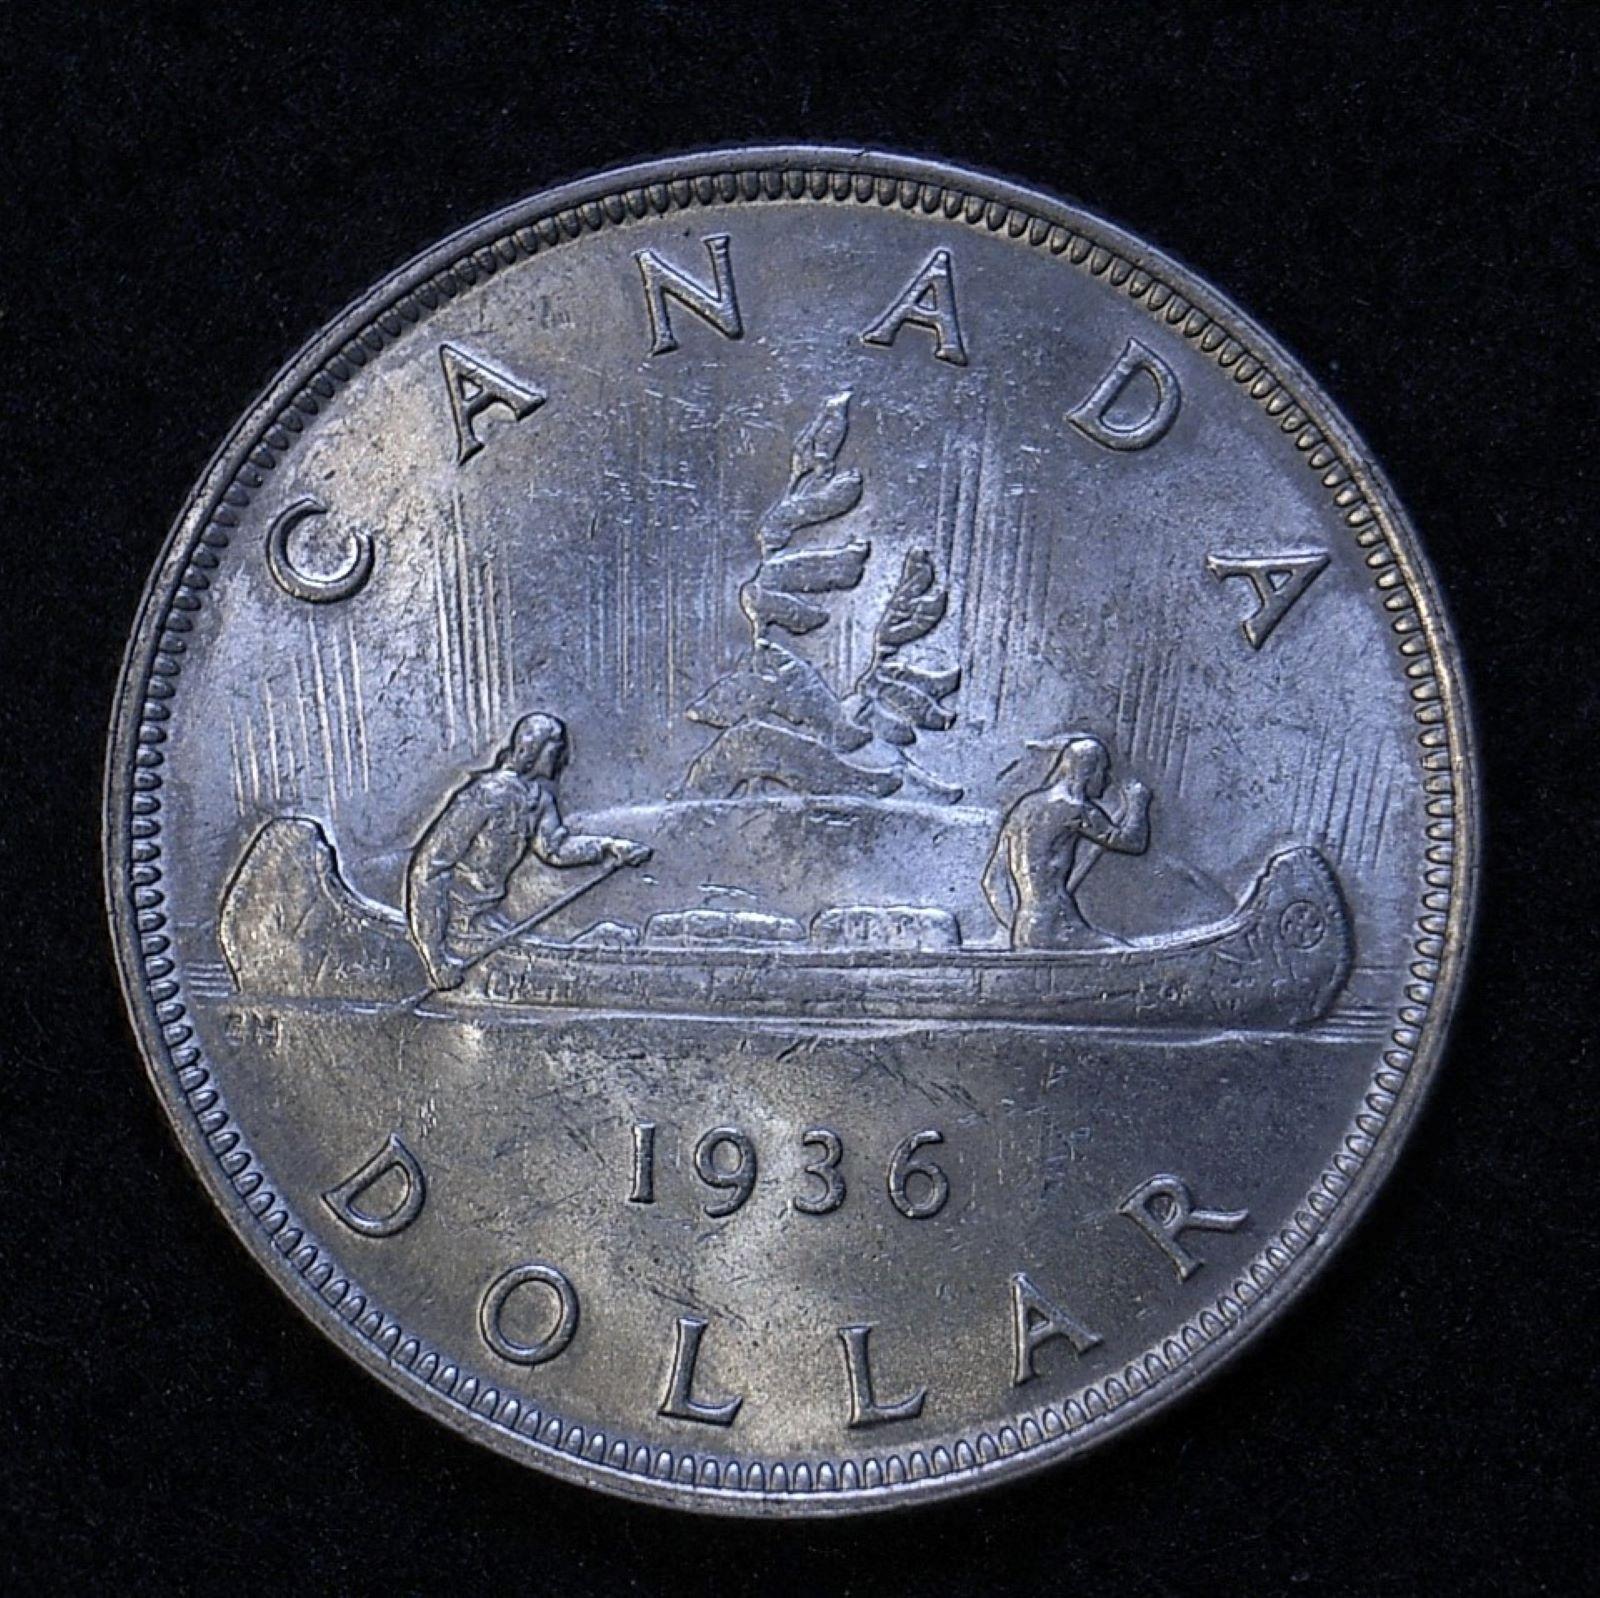 Canada Dollar 1936 rev 1